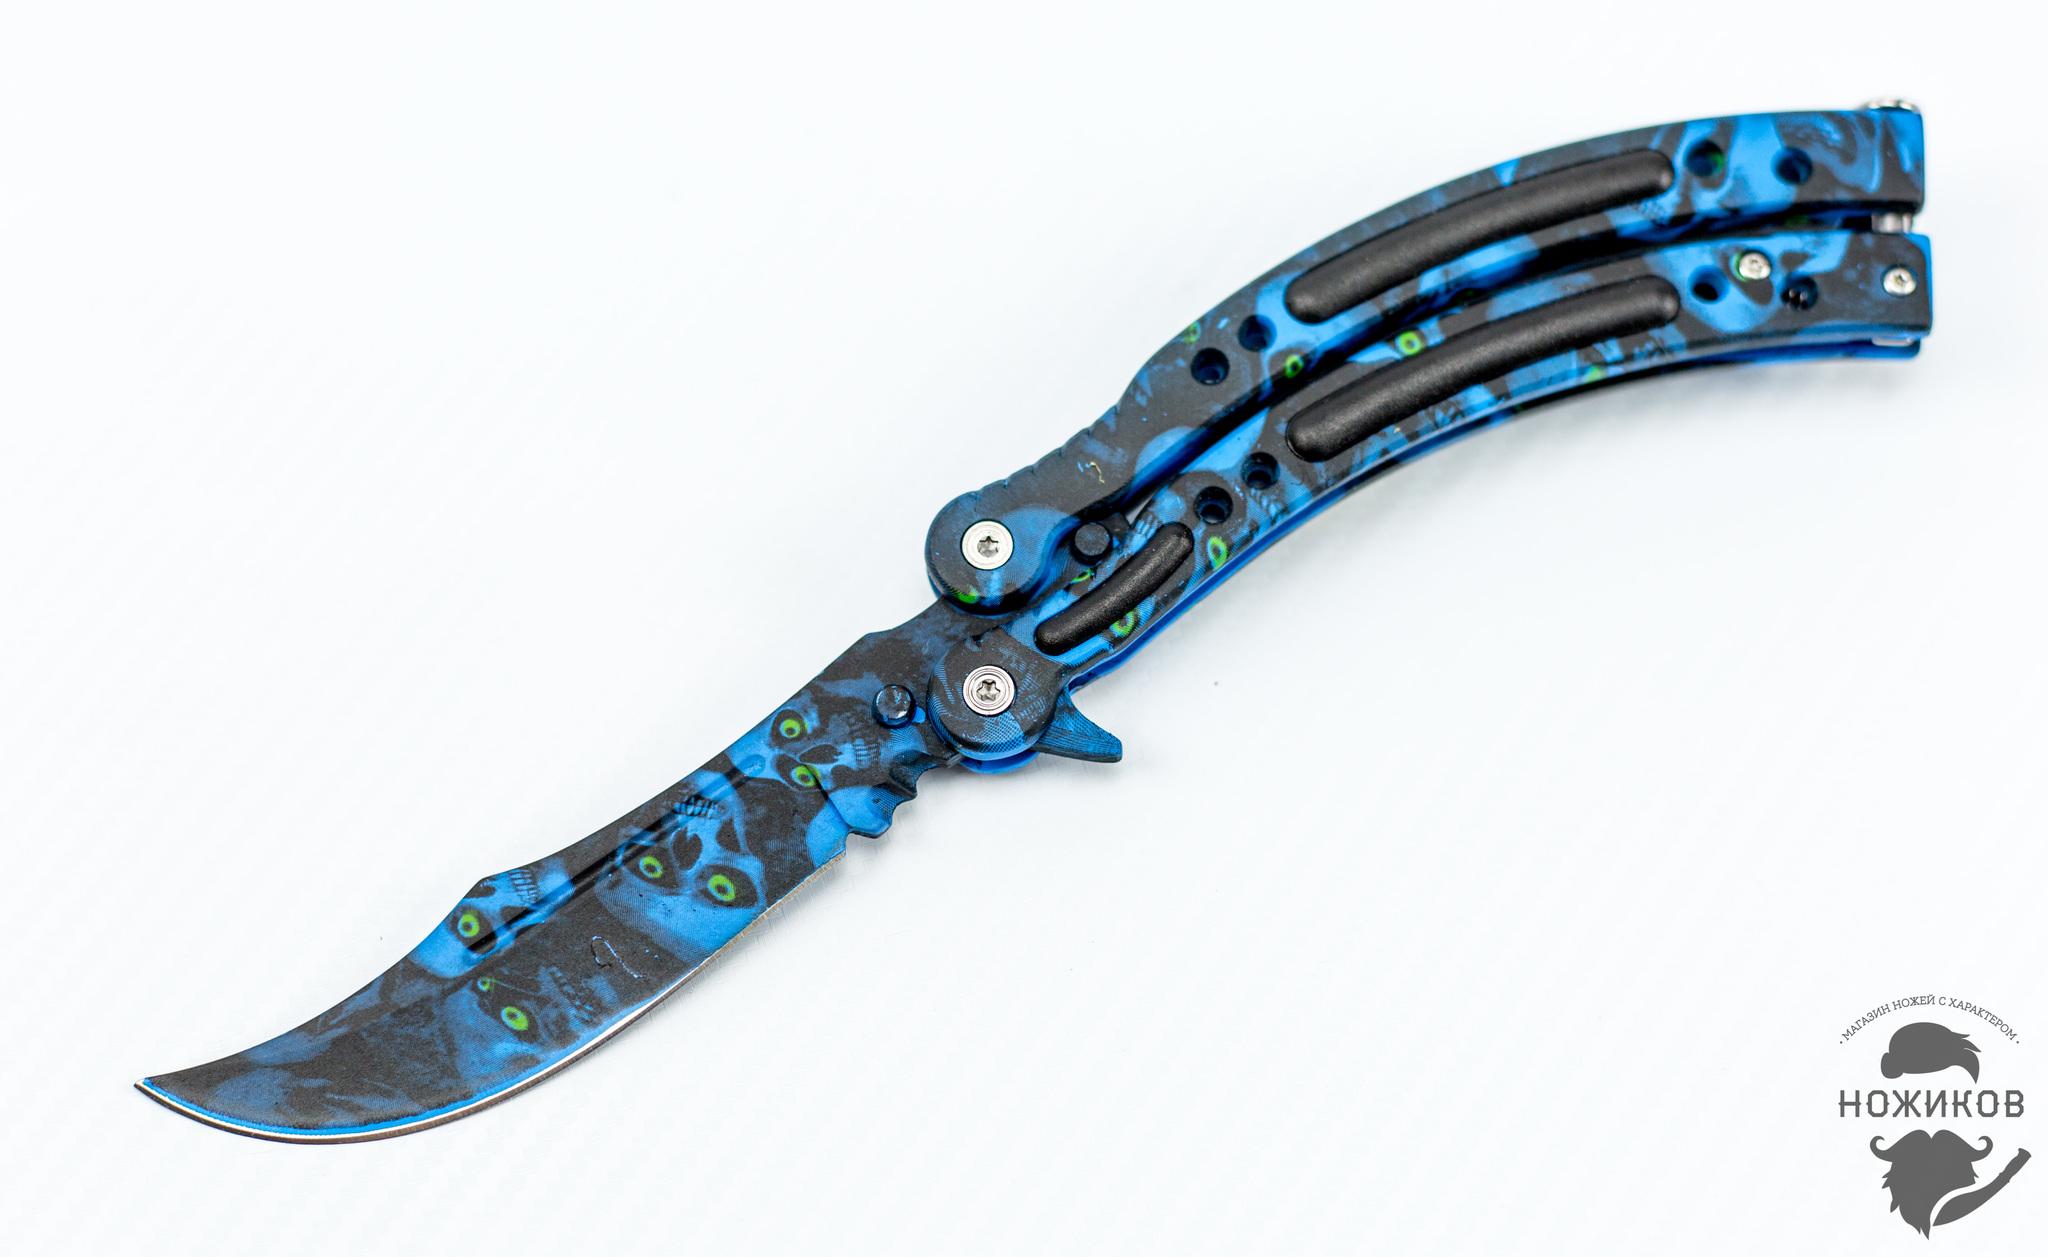 Нож-бабочка (балисонг) CS GO Череп от Noname